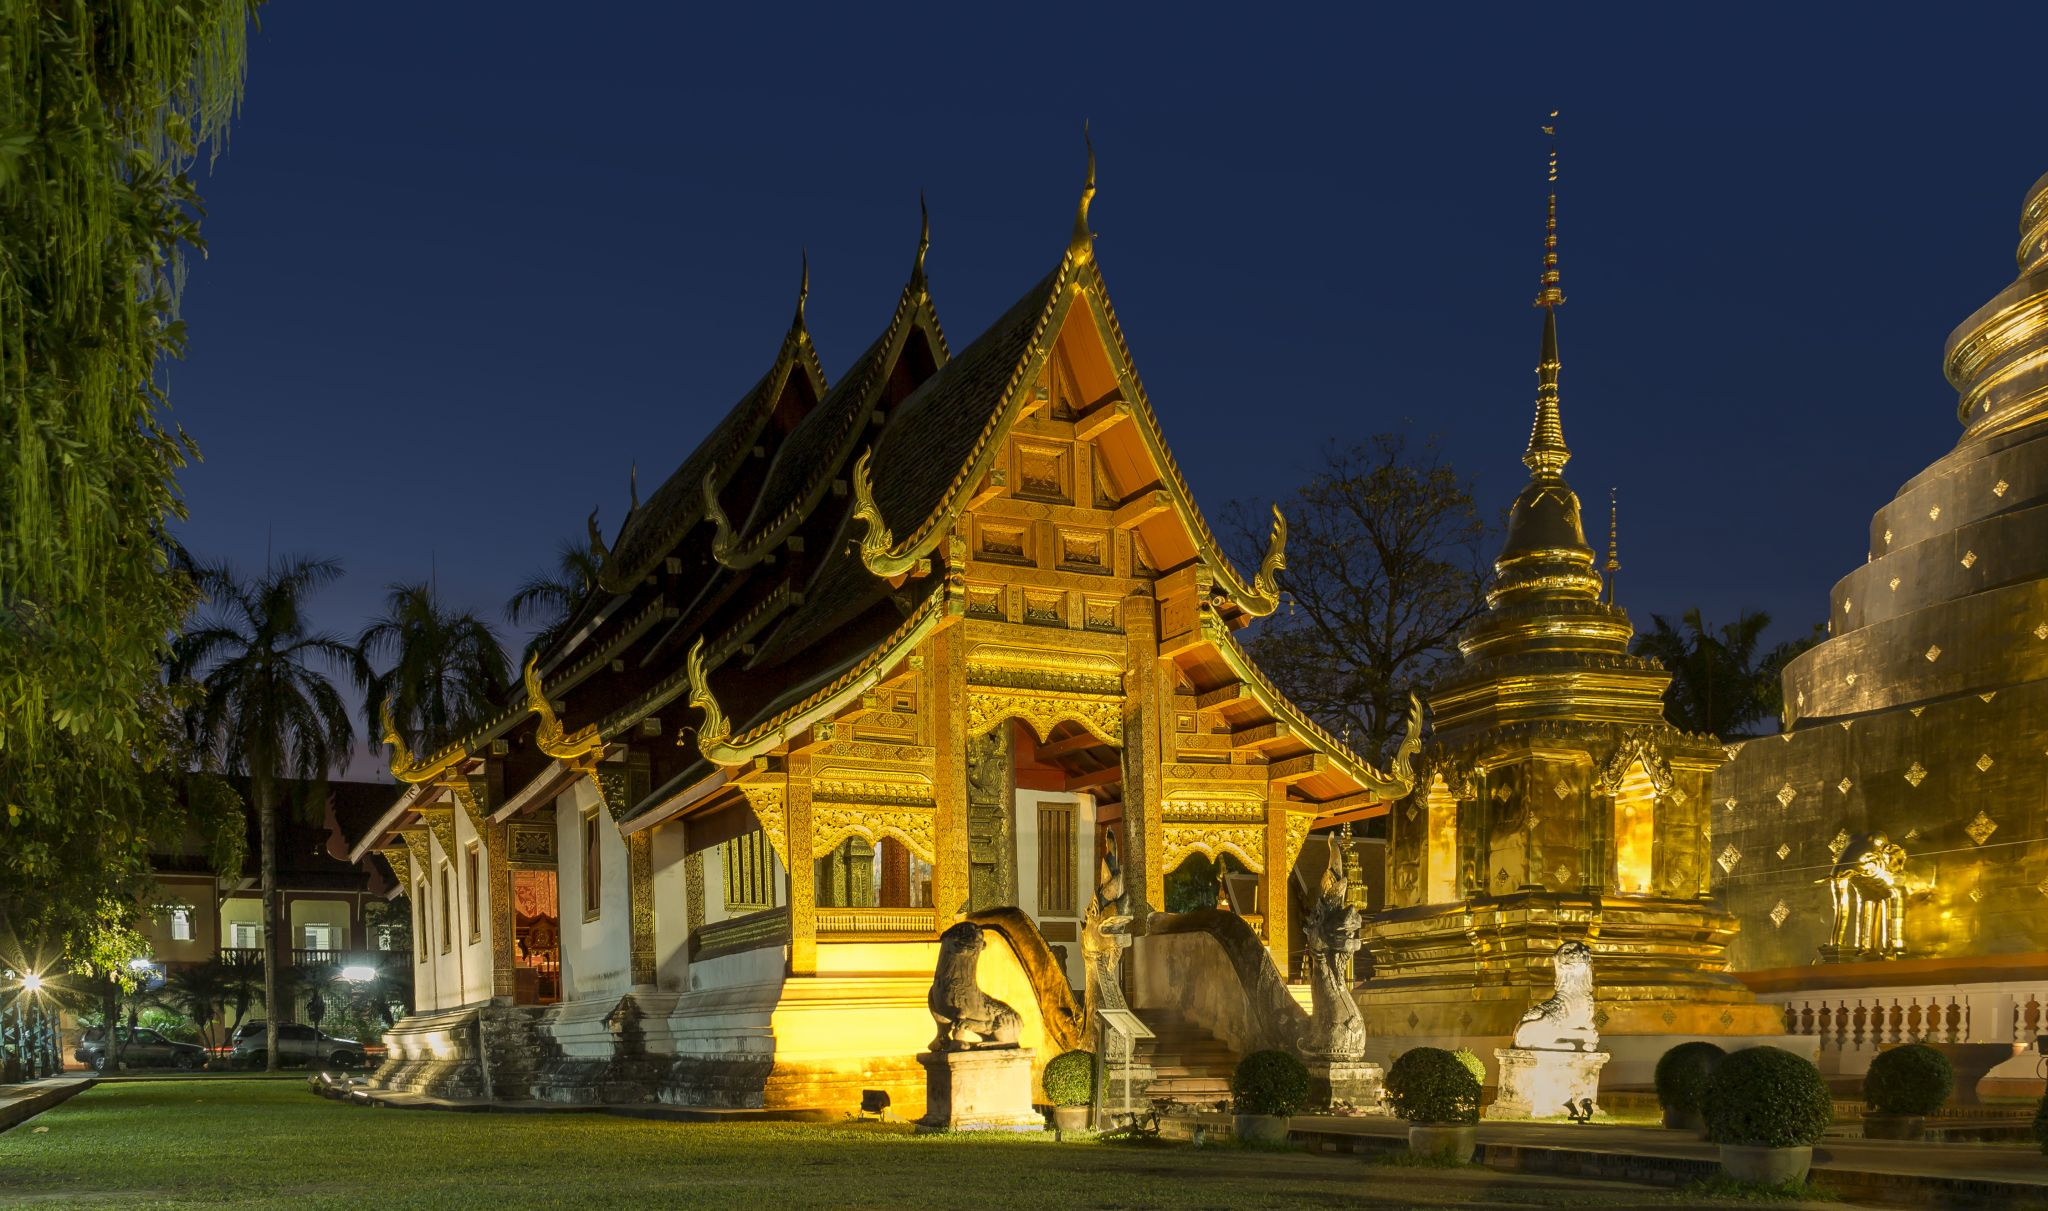 Wat Phra Singh Temple, Thailand